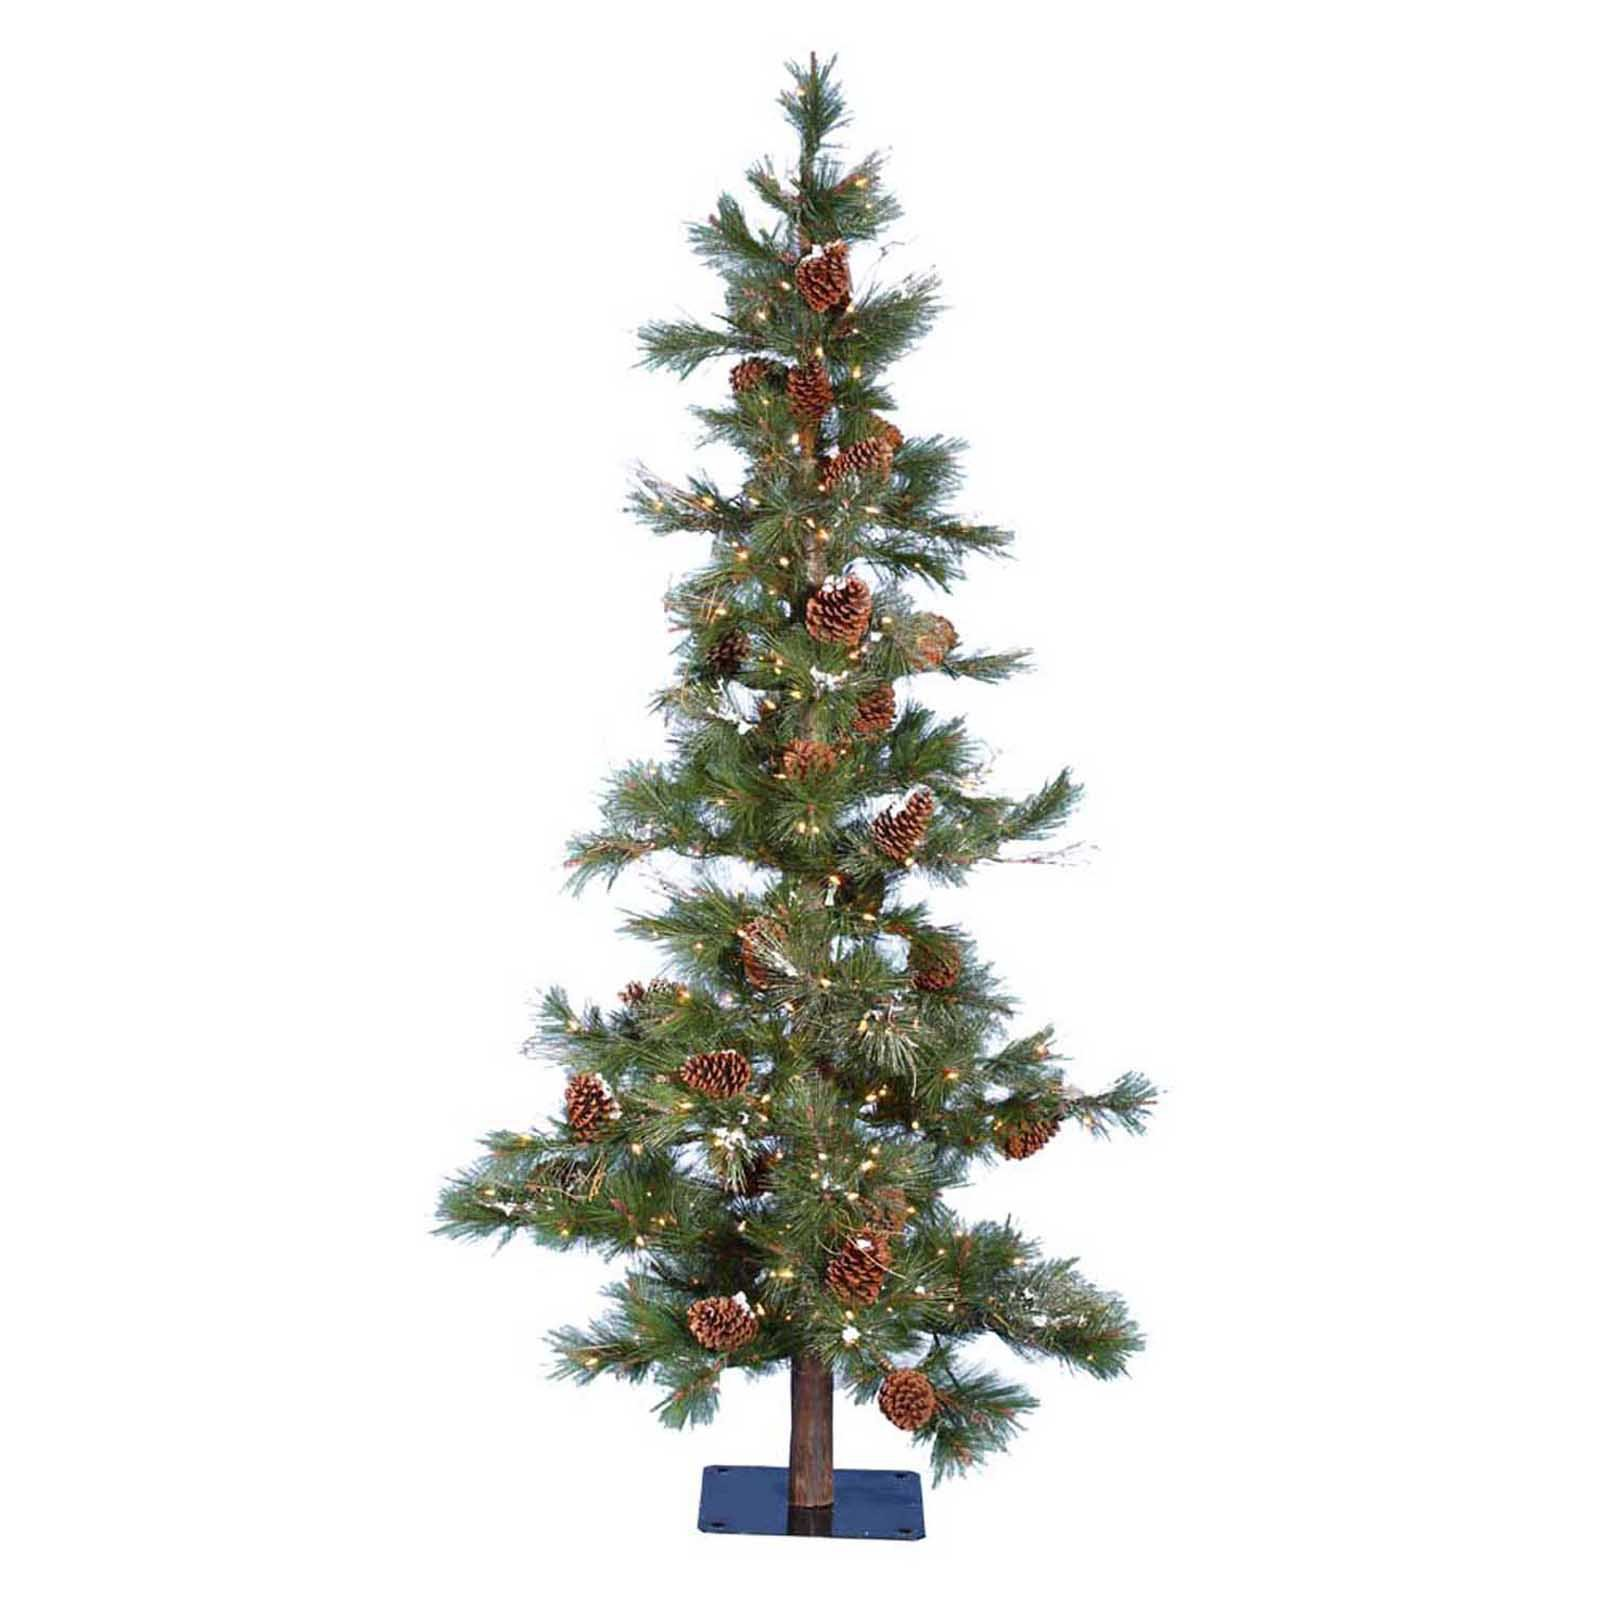 Kurt Adler 7 ft. Big Cone Needle Pine Pre-Lit Christmas Tree